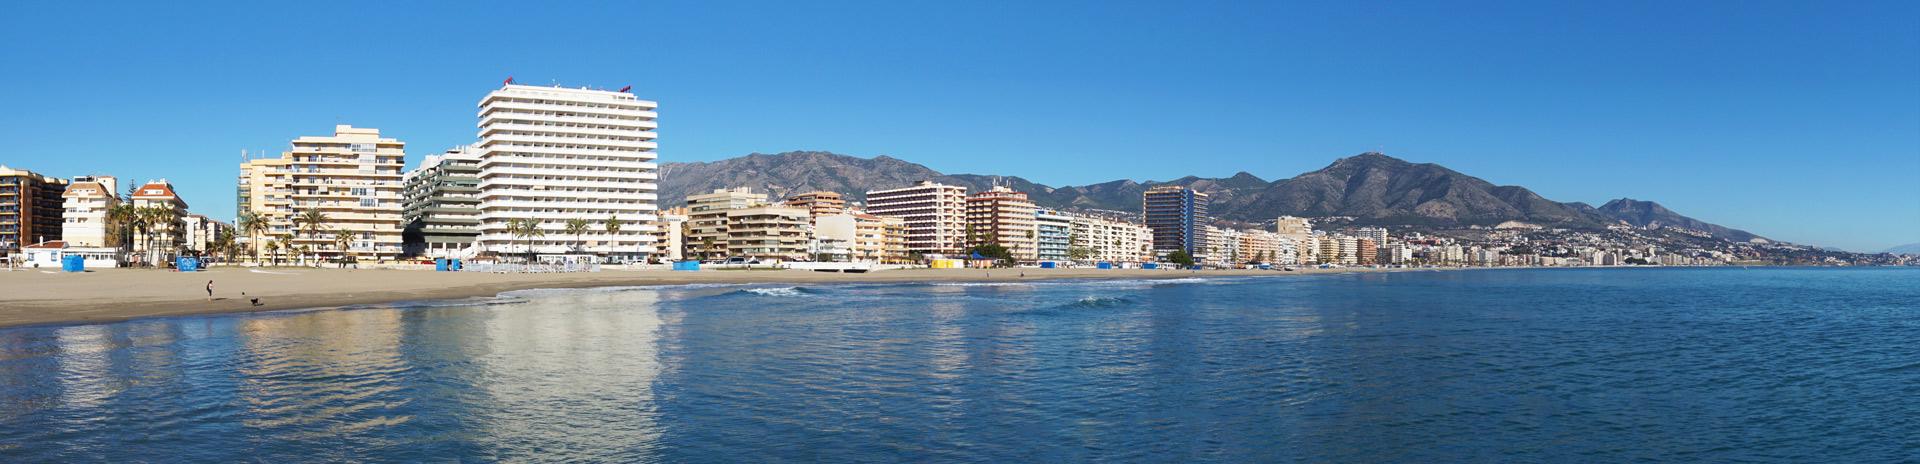 Bostad till salu Fuengirola